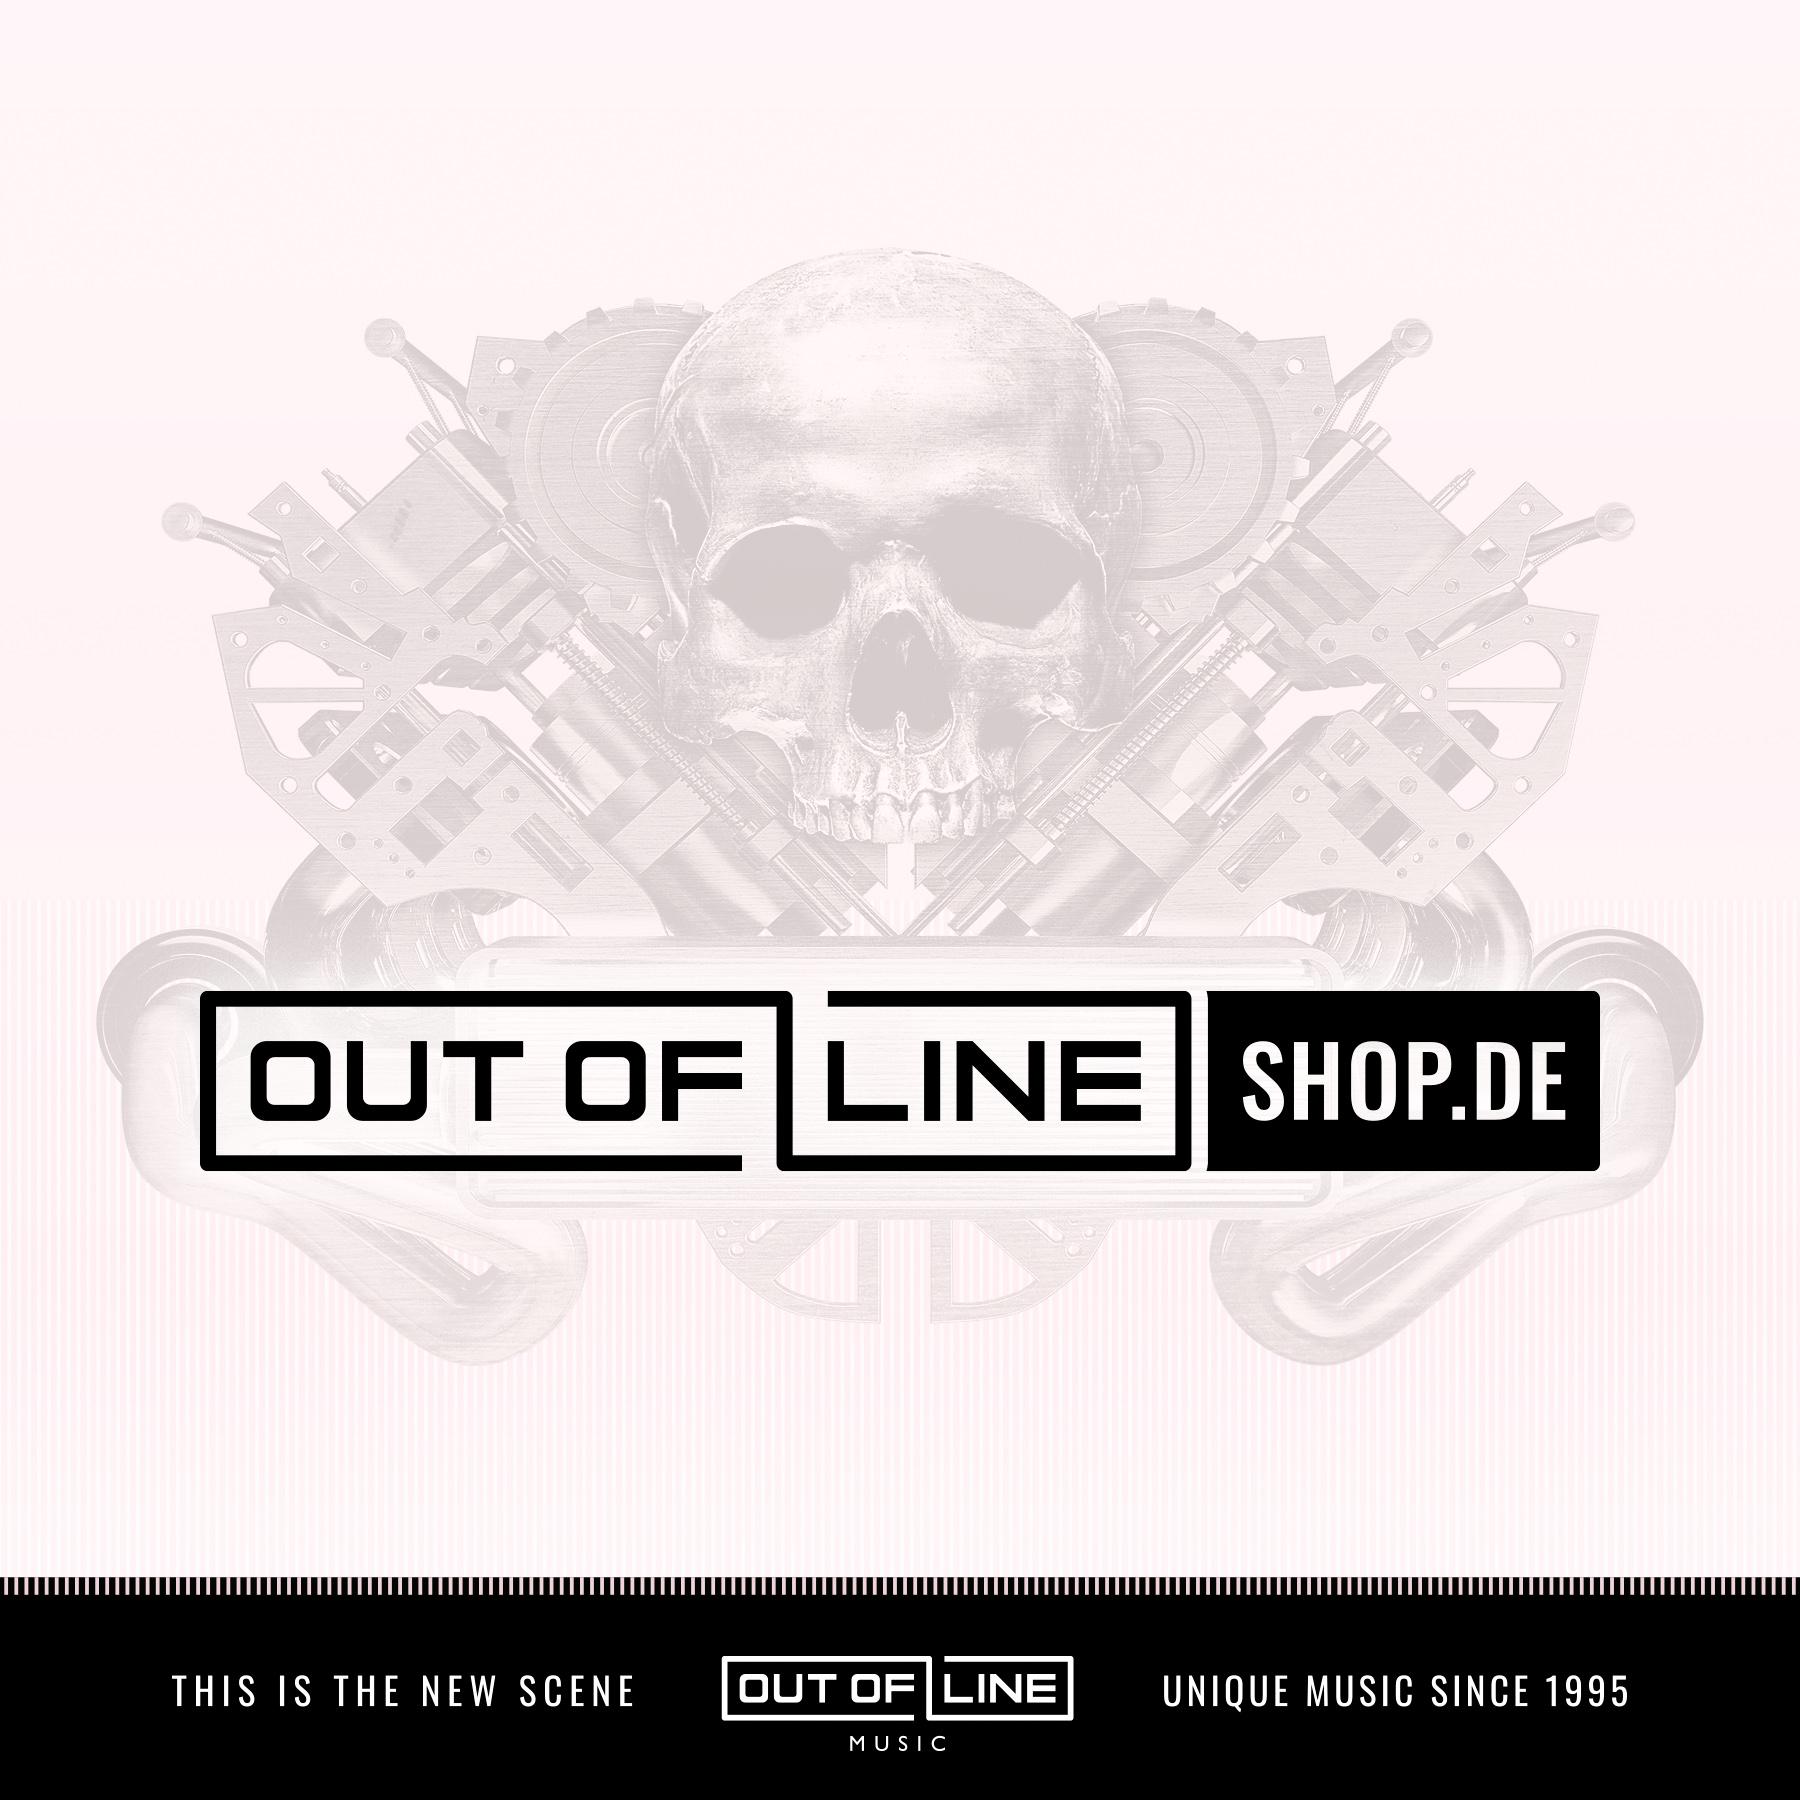 Solar Fake - This pretty Life (Limited Edition) - MaxiCD